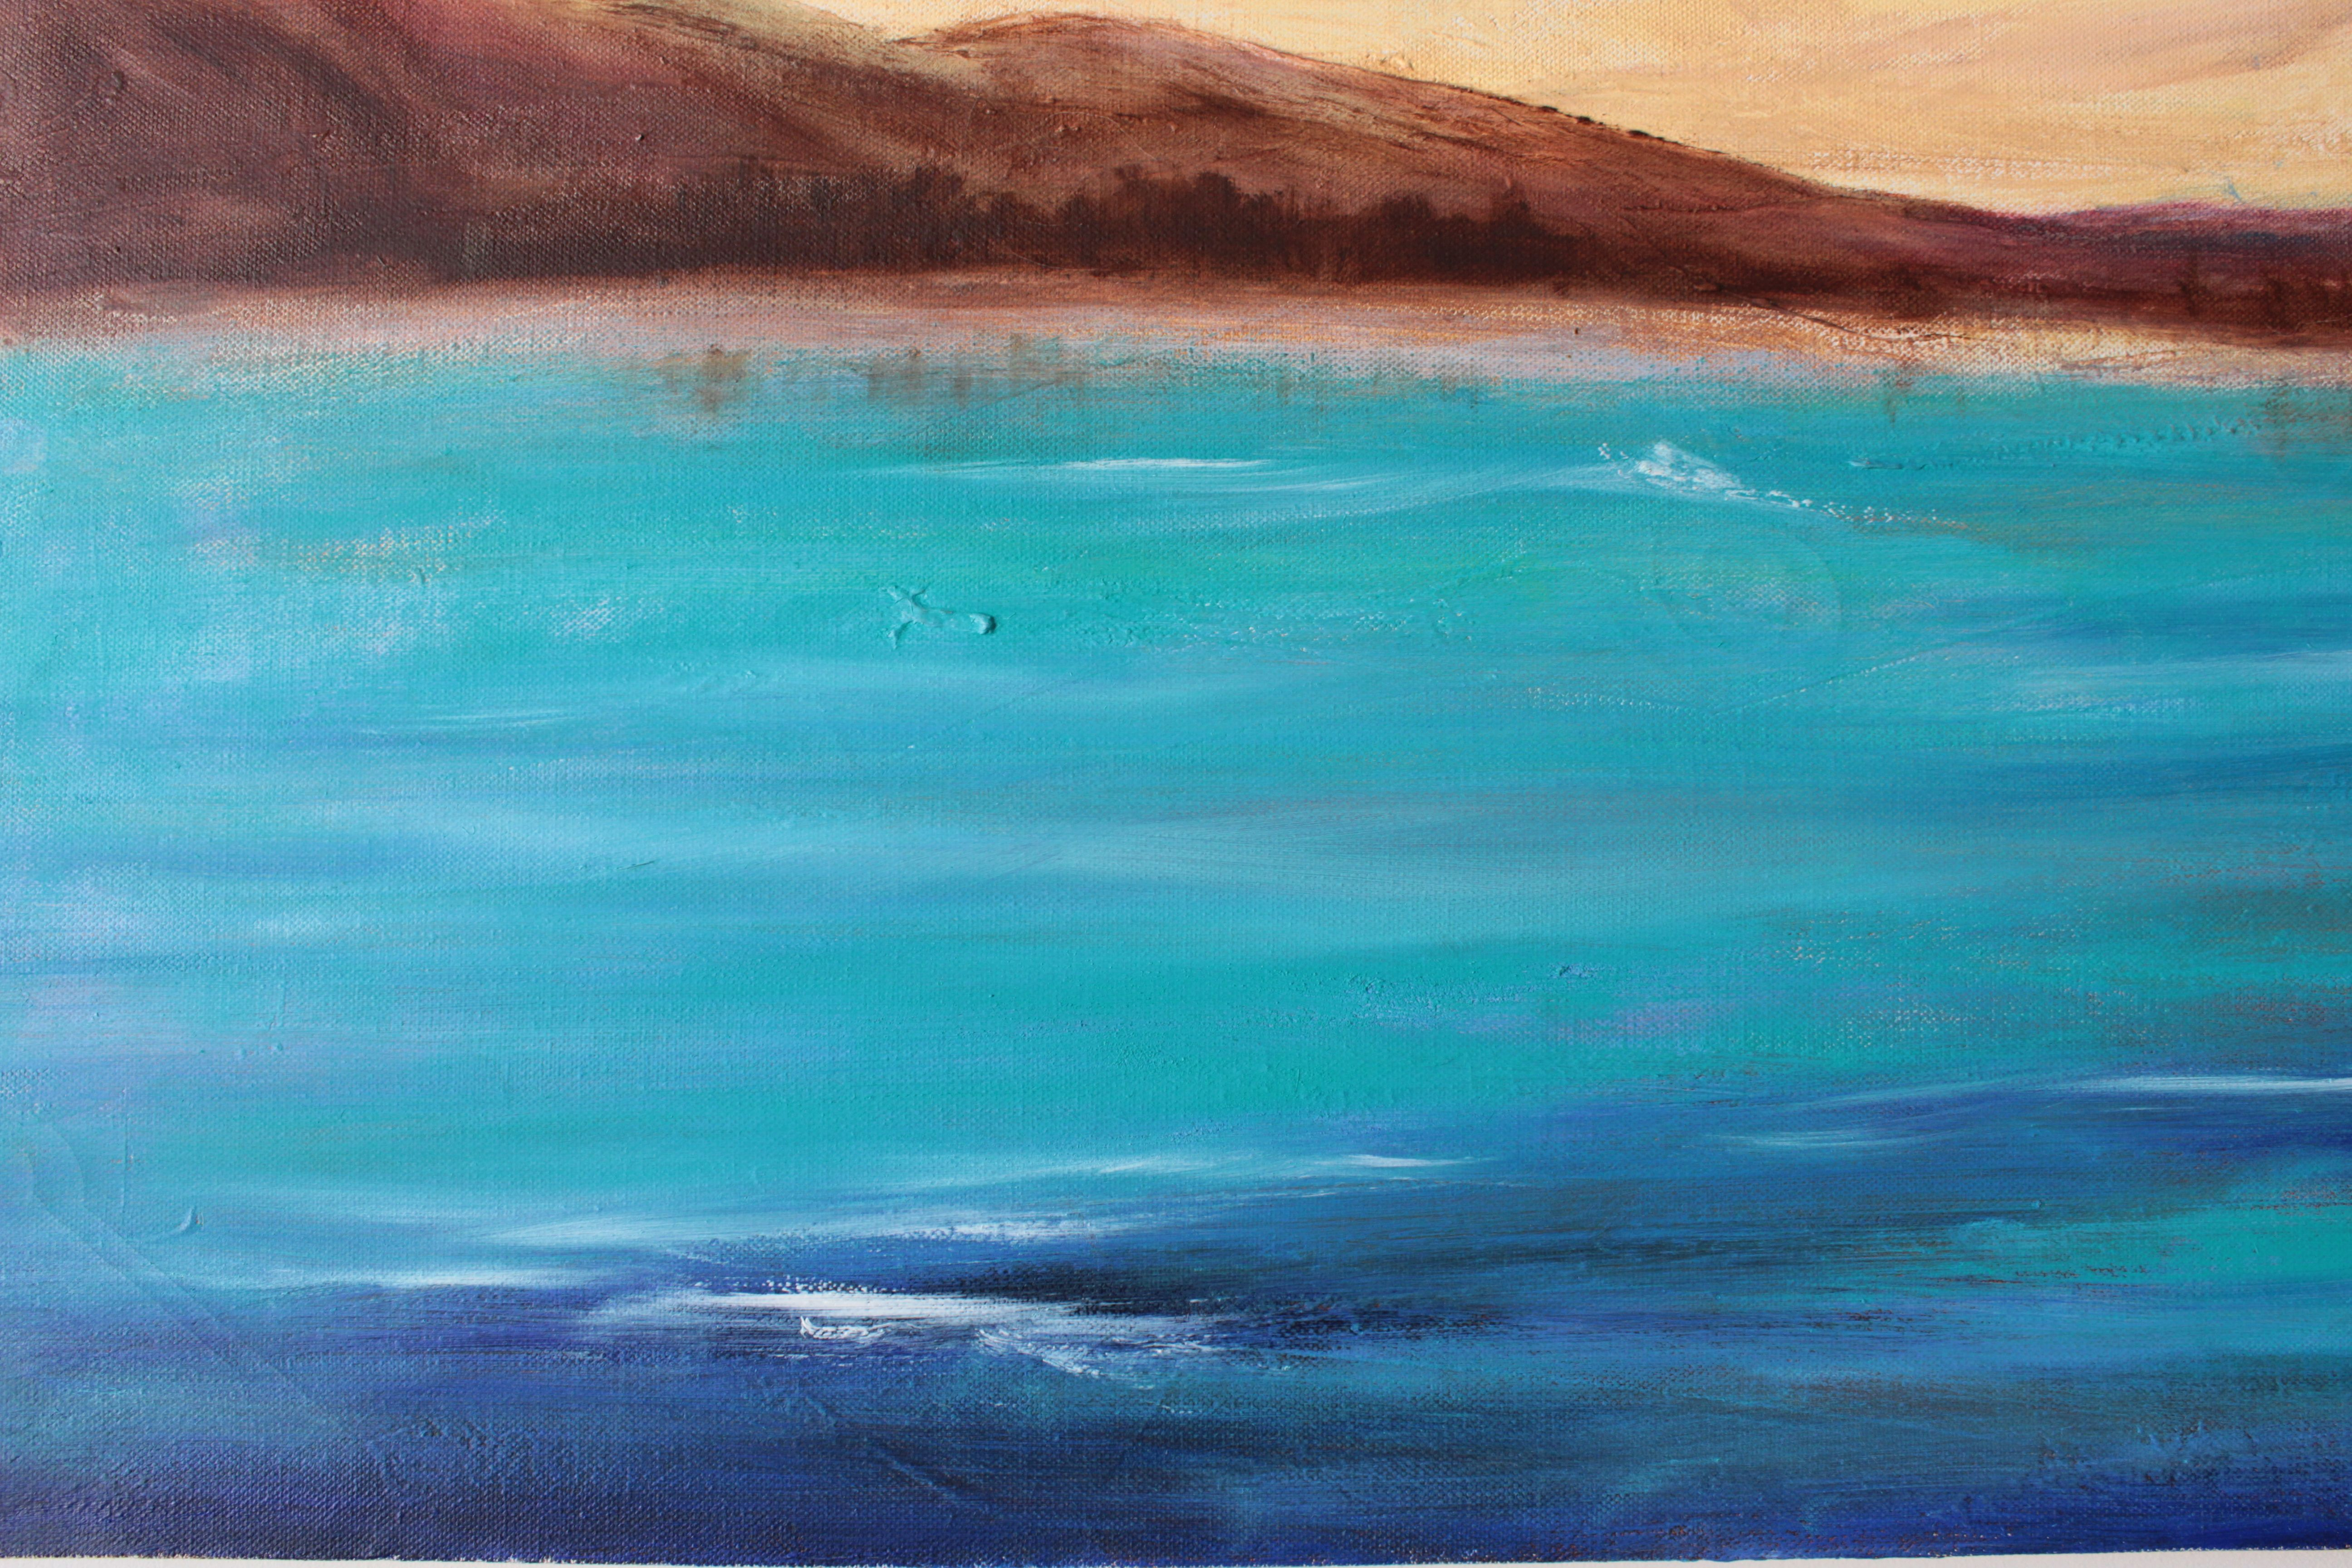 Painting impressionistic landscapes debi riley for Basic portrait painting